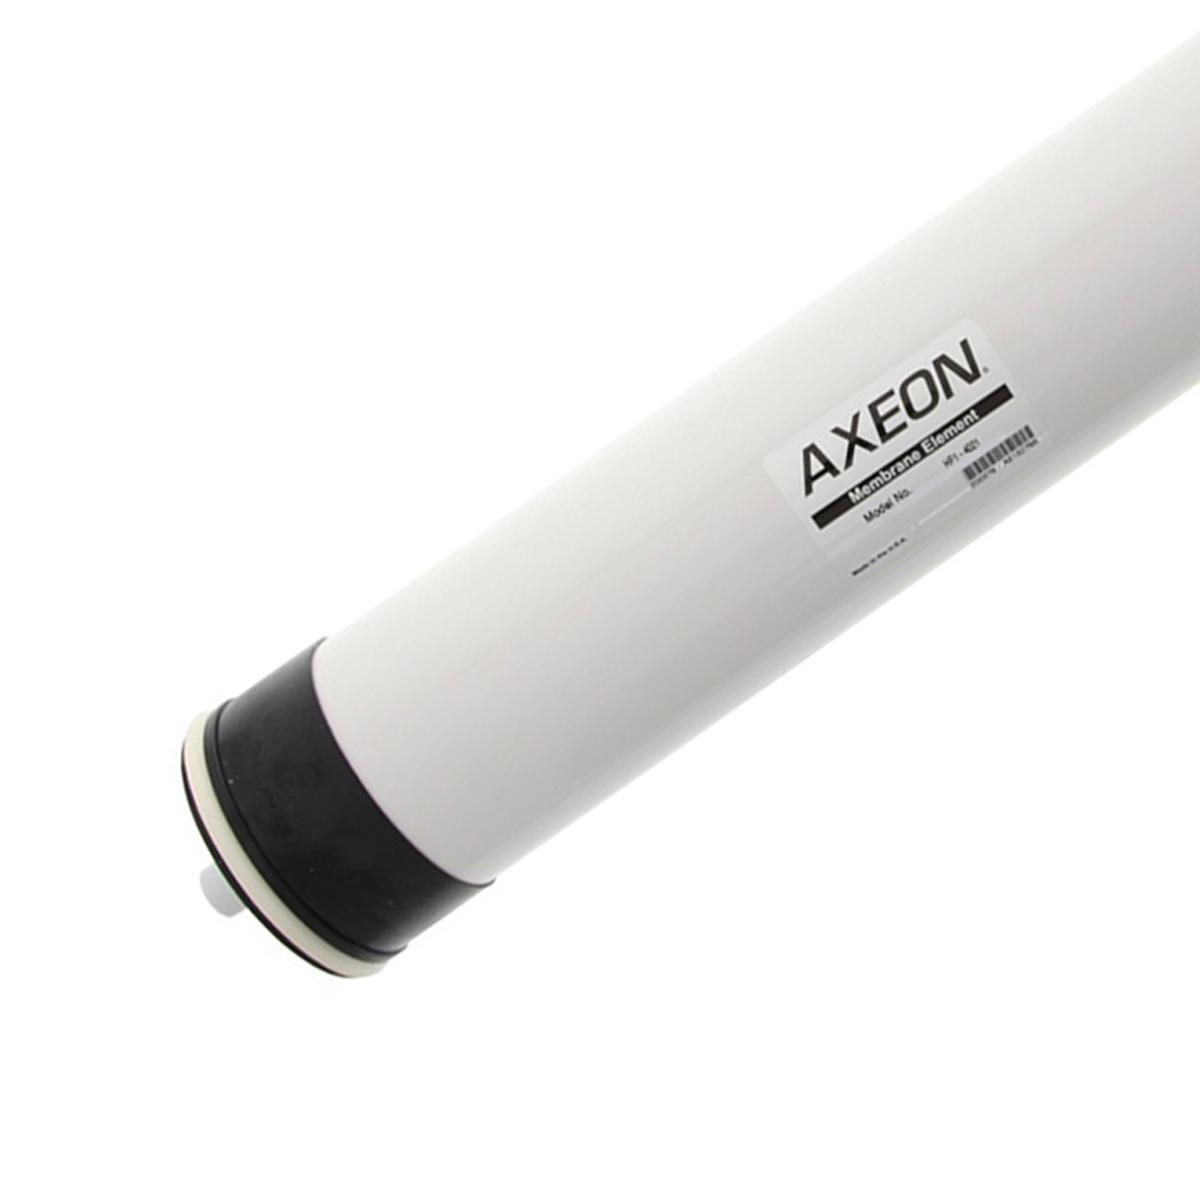 Axeon Nf4 Nanofiltration Membrane Element 4021 Dry